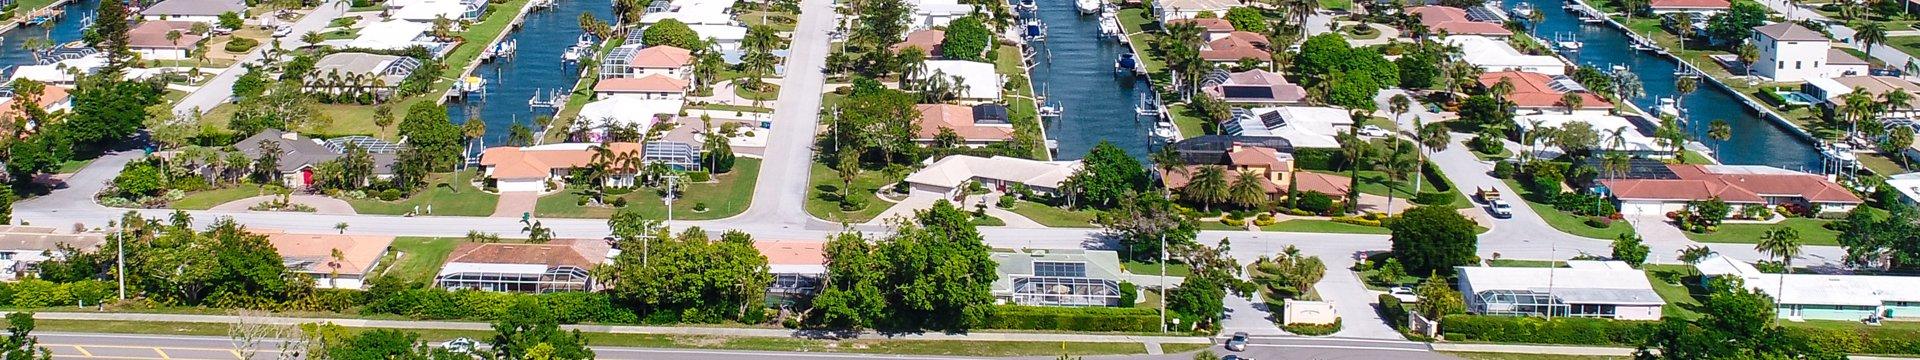 Sarasota/Longboat Key